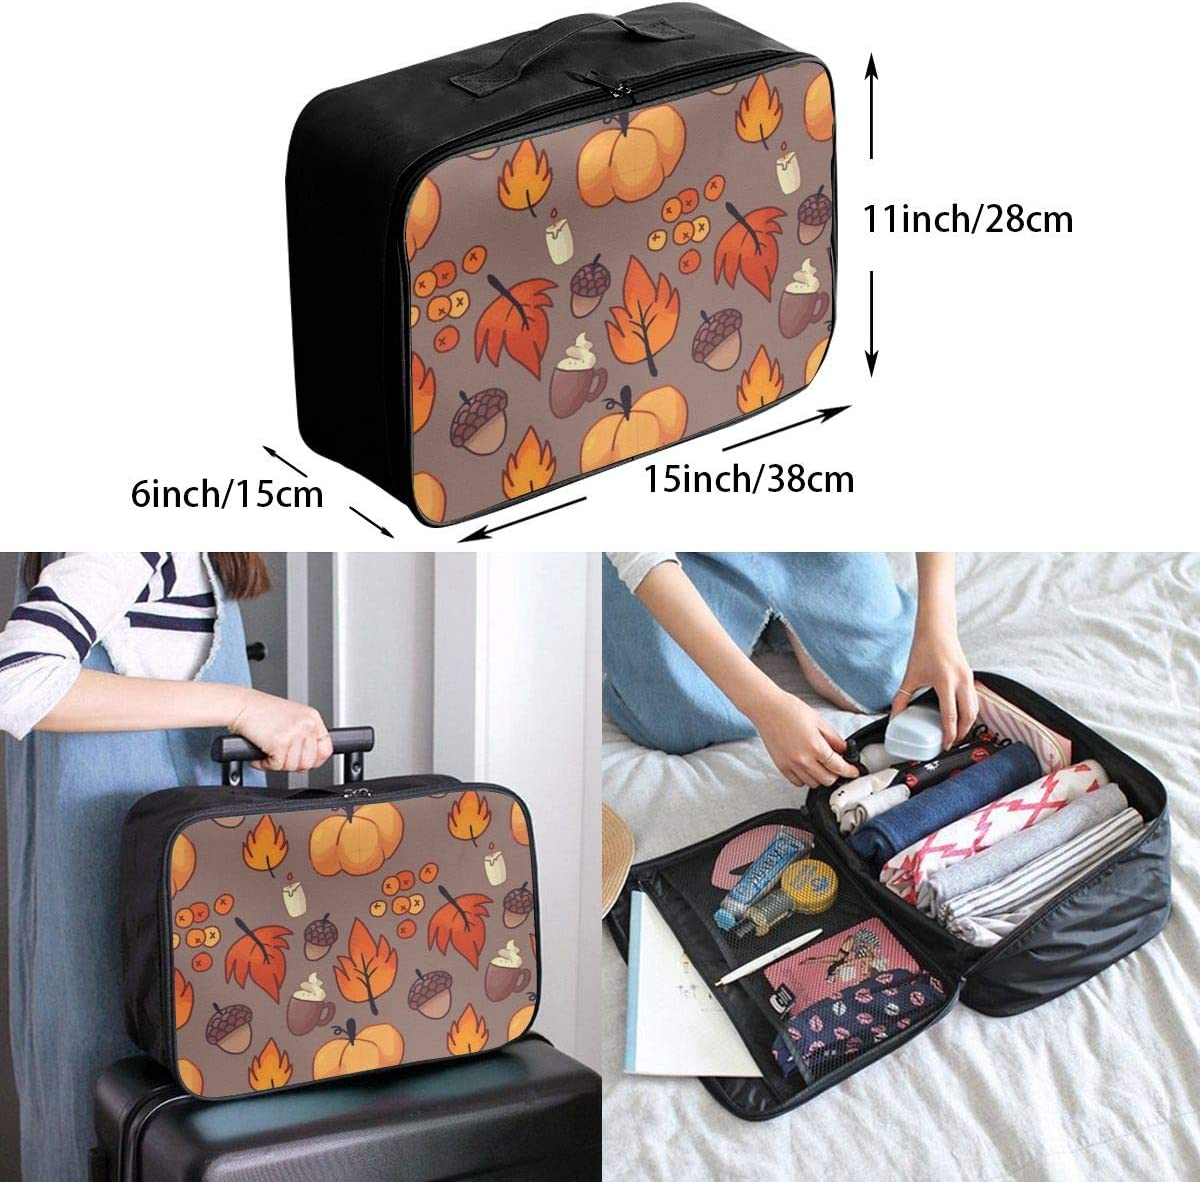 Maple Leaf Pumpkin Travel Carry-on Luggage Weekender Bag Overnight Tote Flight Duffel In Trolley Handle